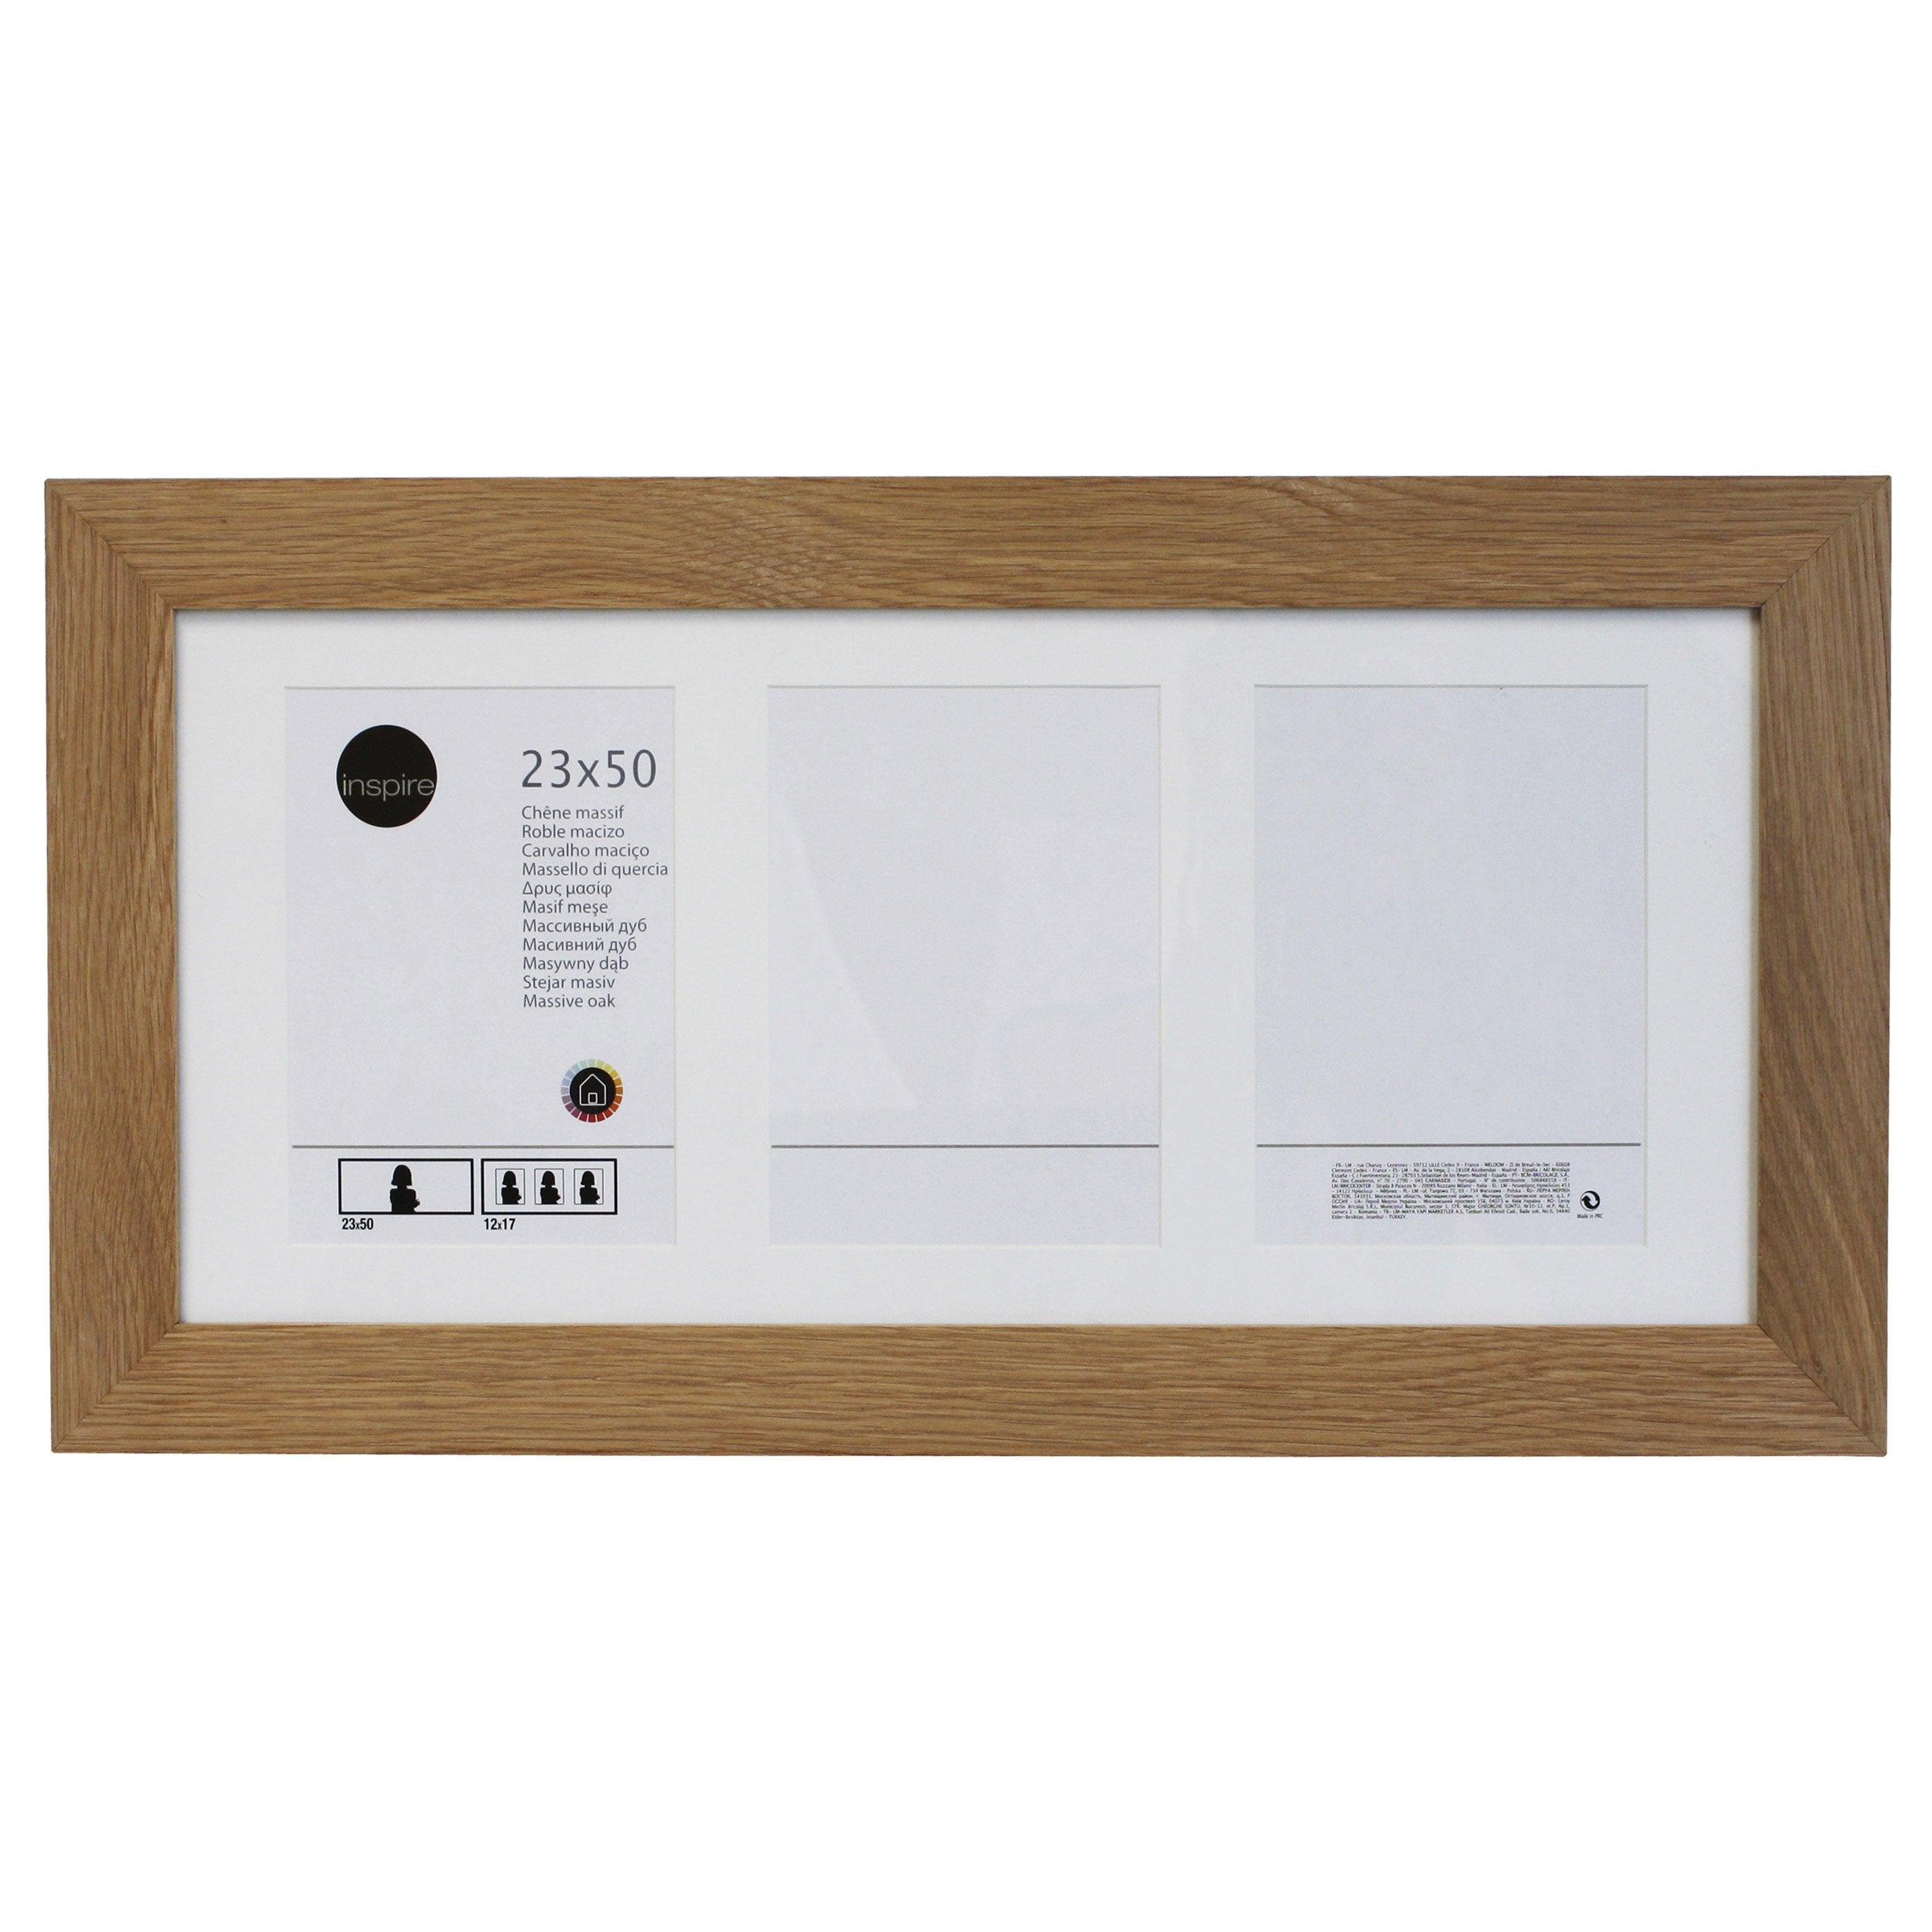 Cadre multivue Nakato, l.23 x H.50 cm, chêne clair